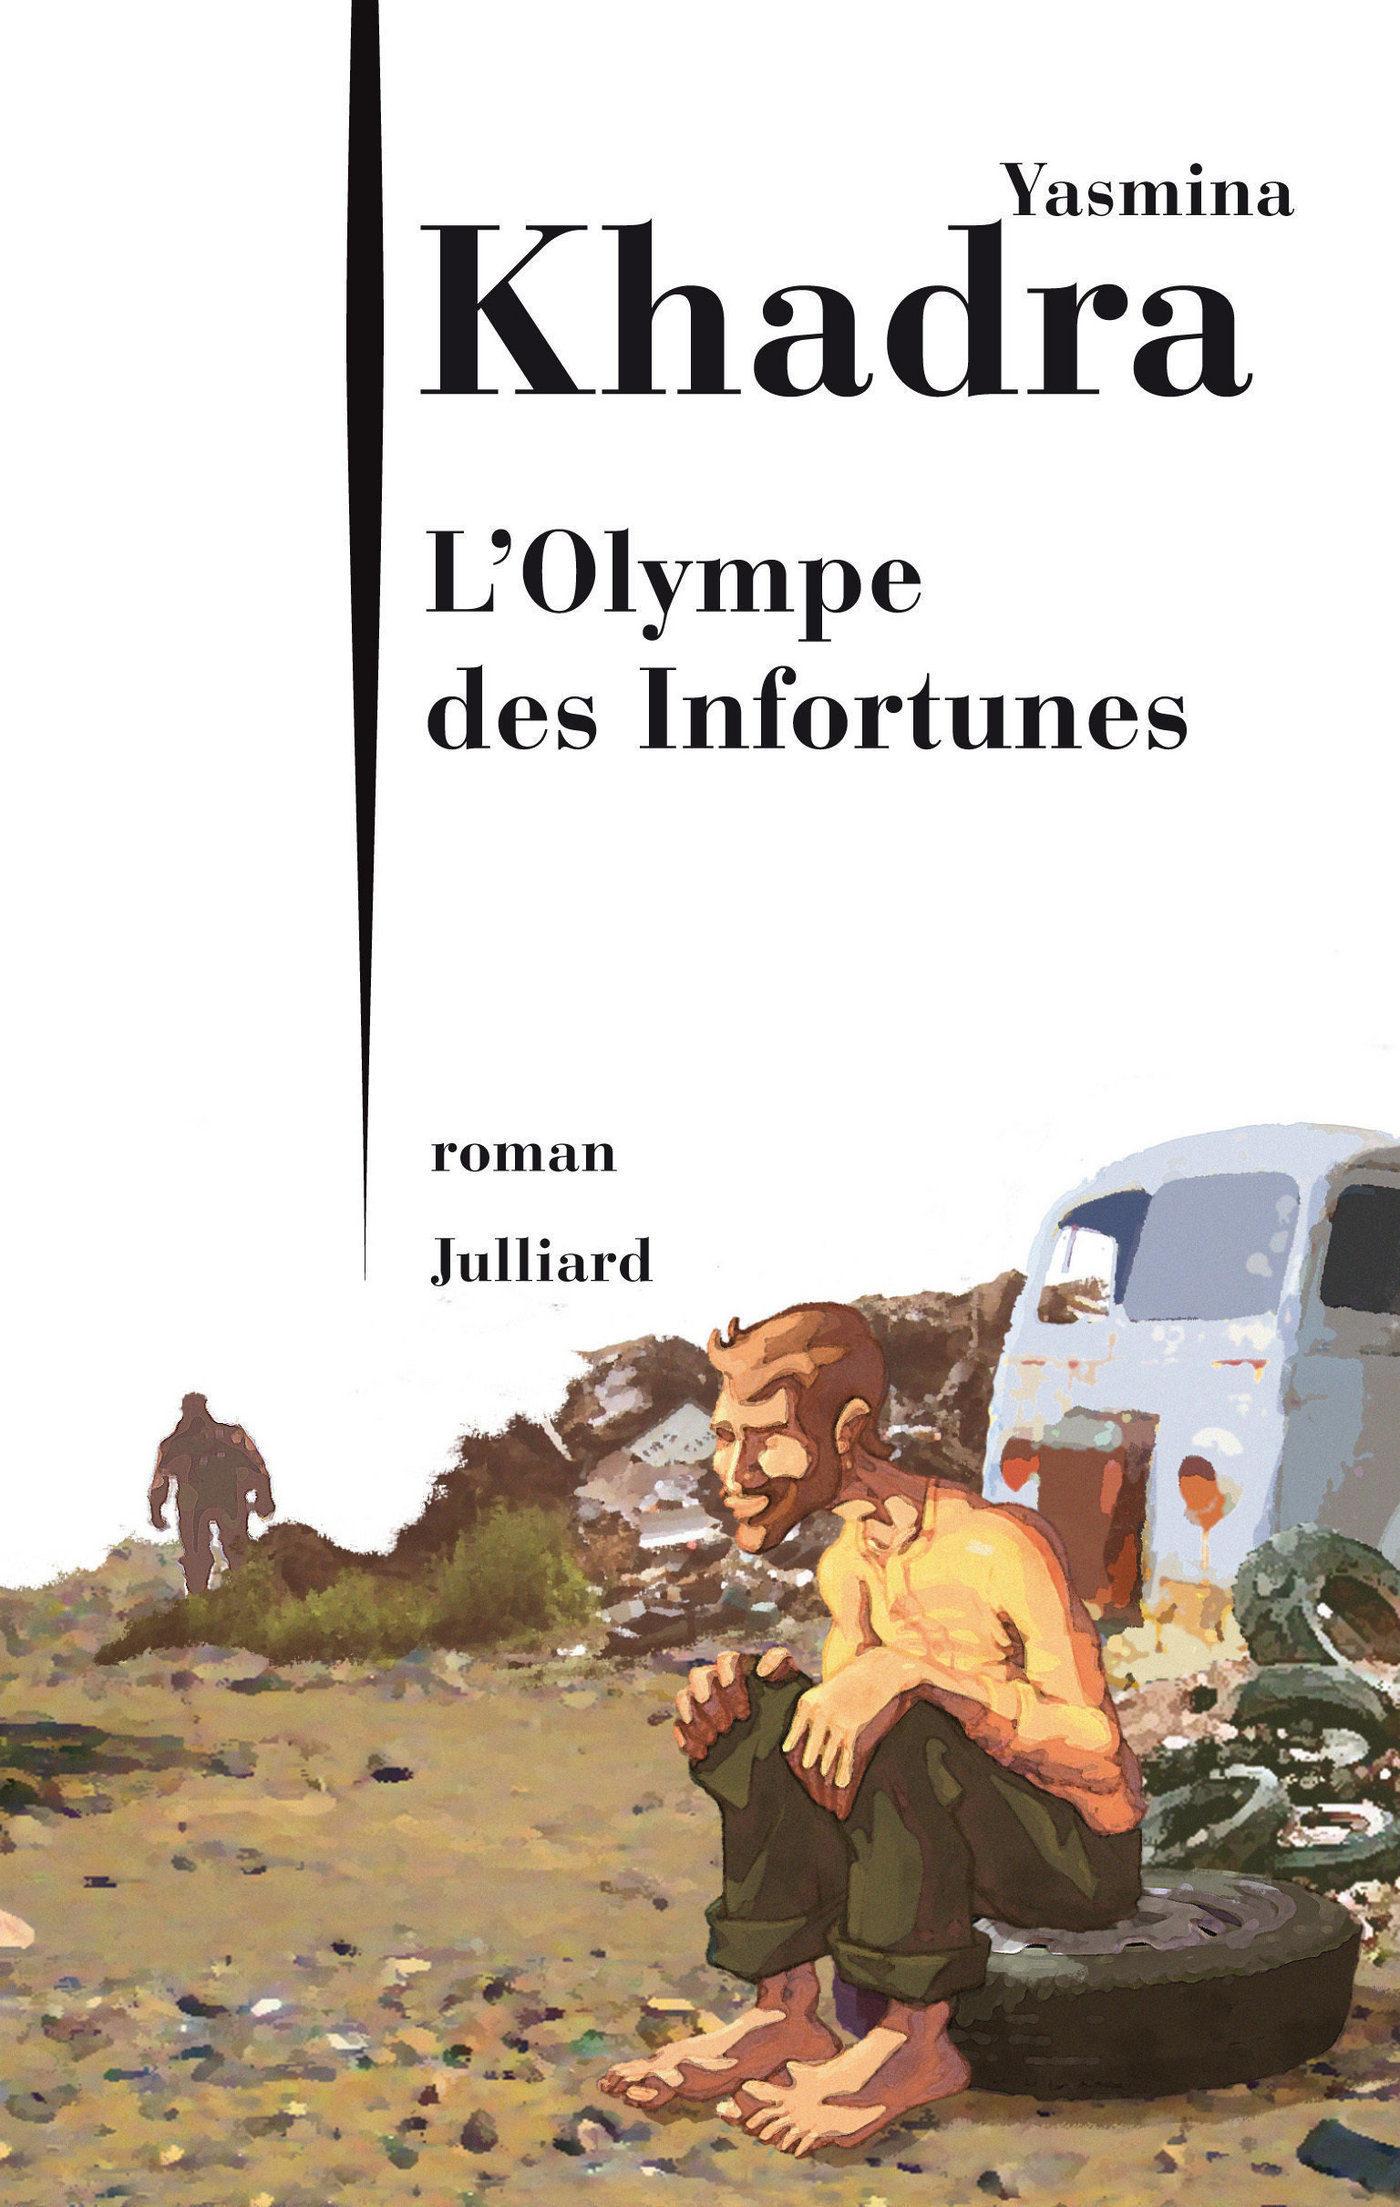 L'Olympe des infortunes